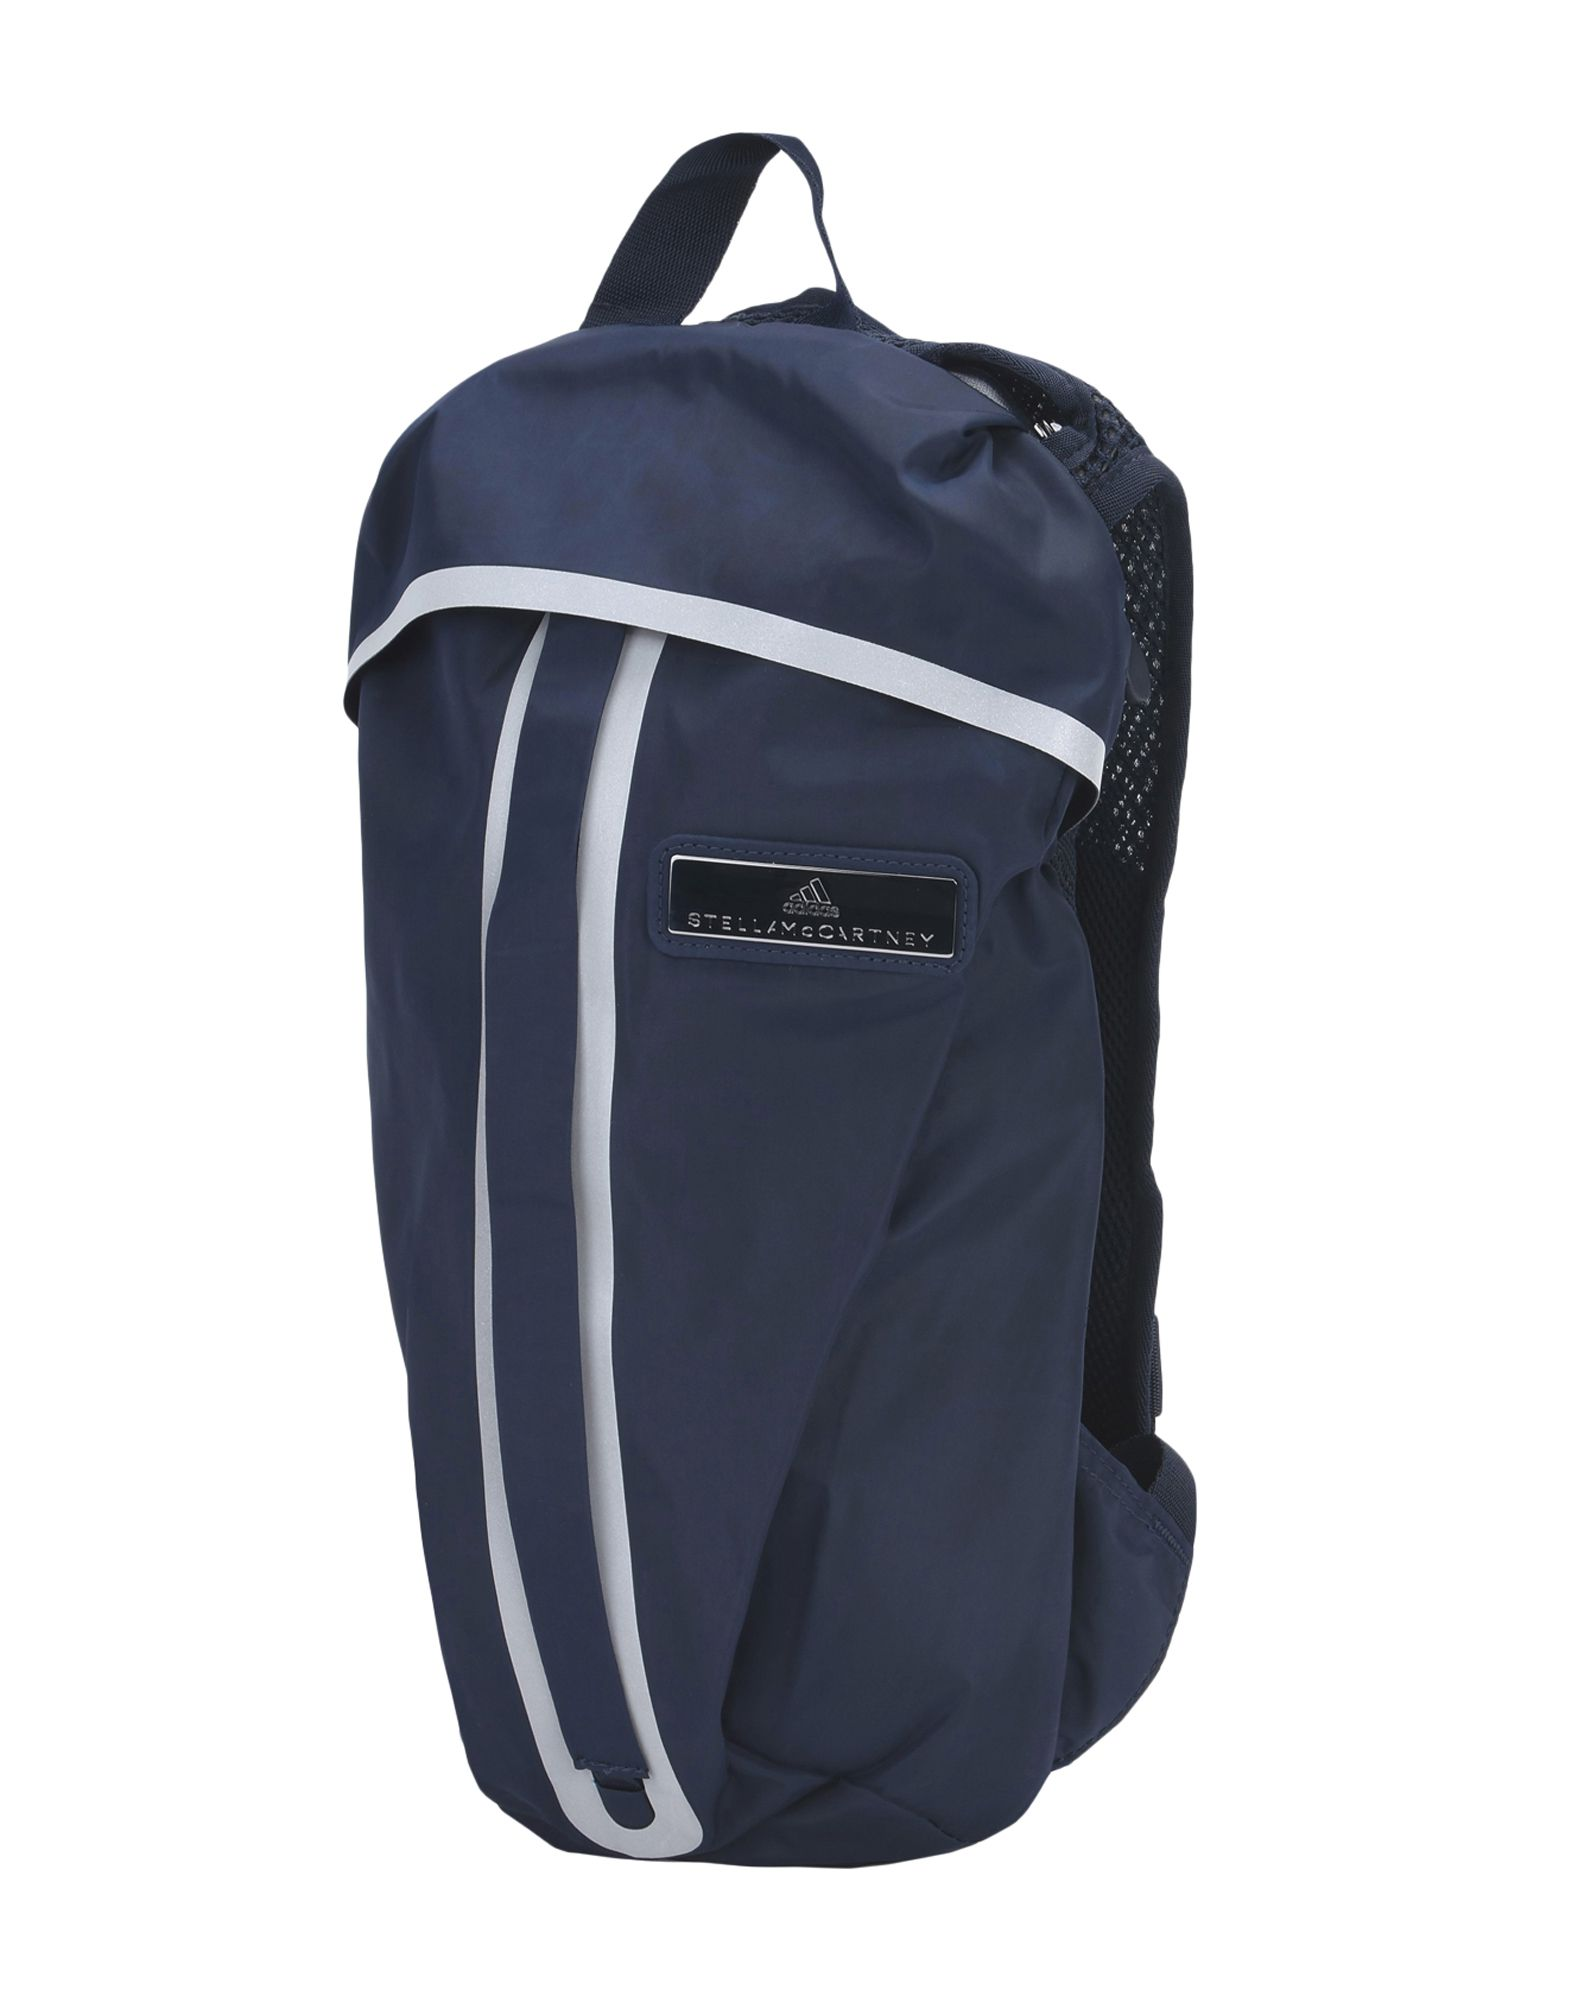 ADIDAS by STELLA McCARTNEY Рюкзаки и сумки на пояс рюкзак adidas 2014 m67763